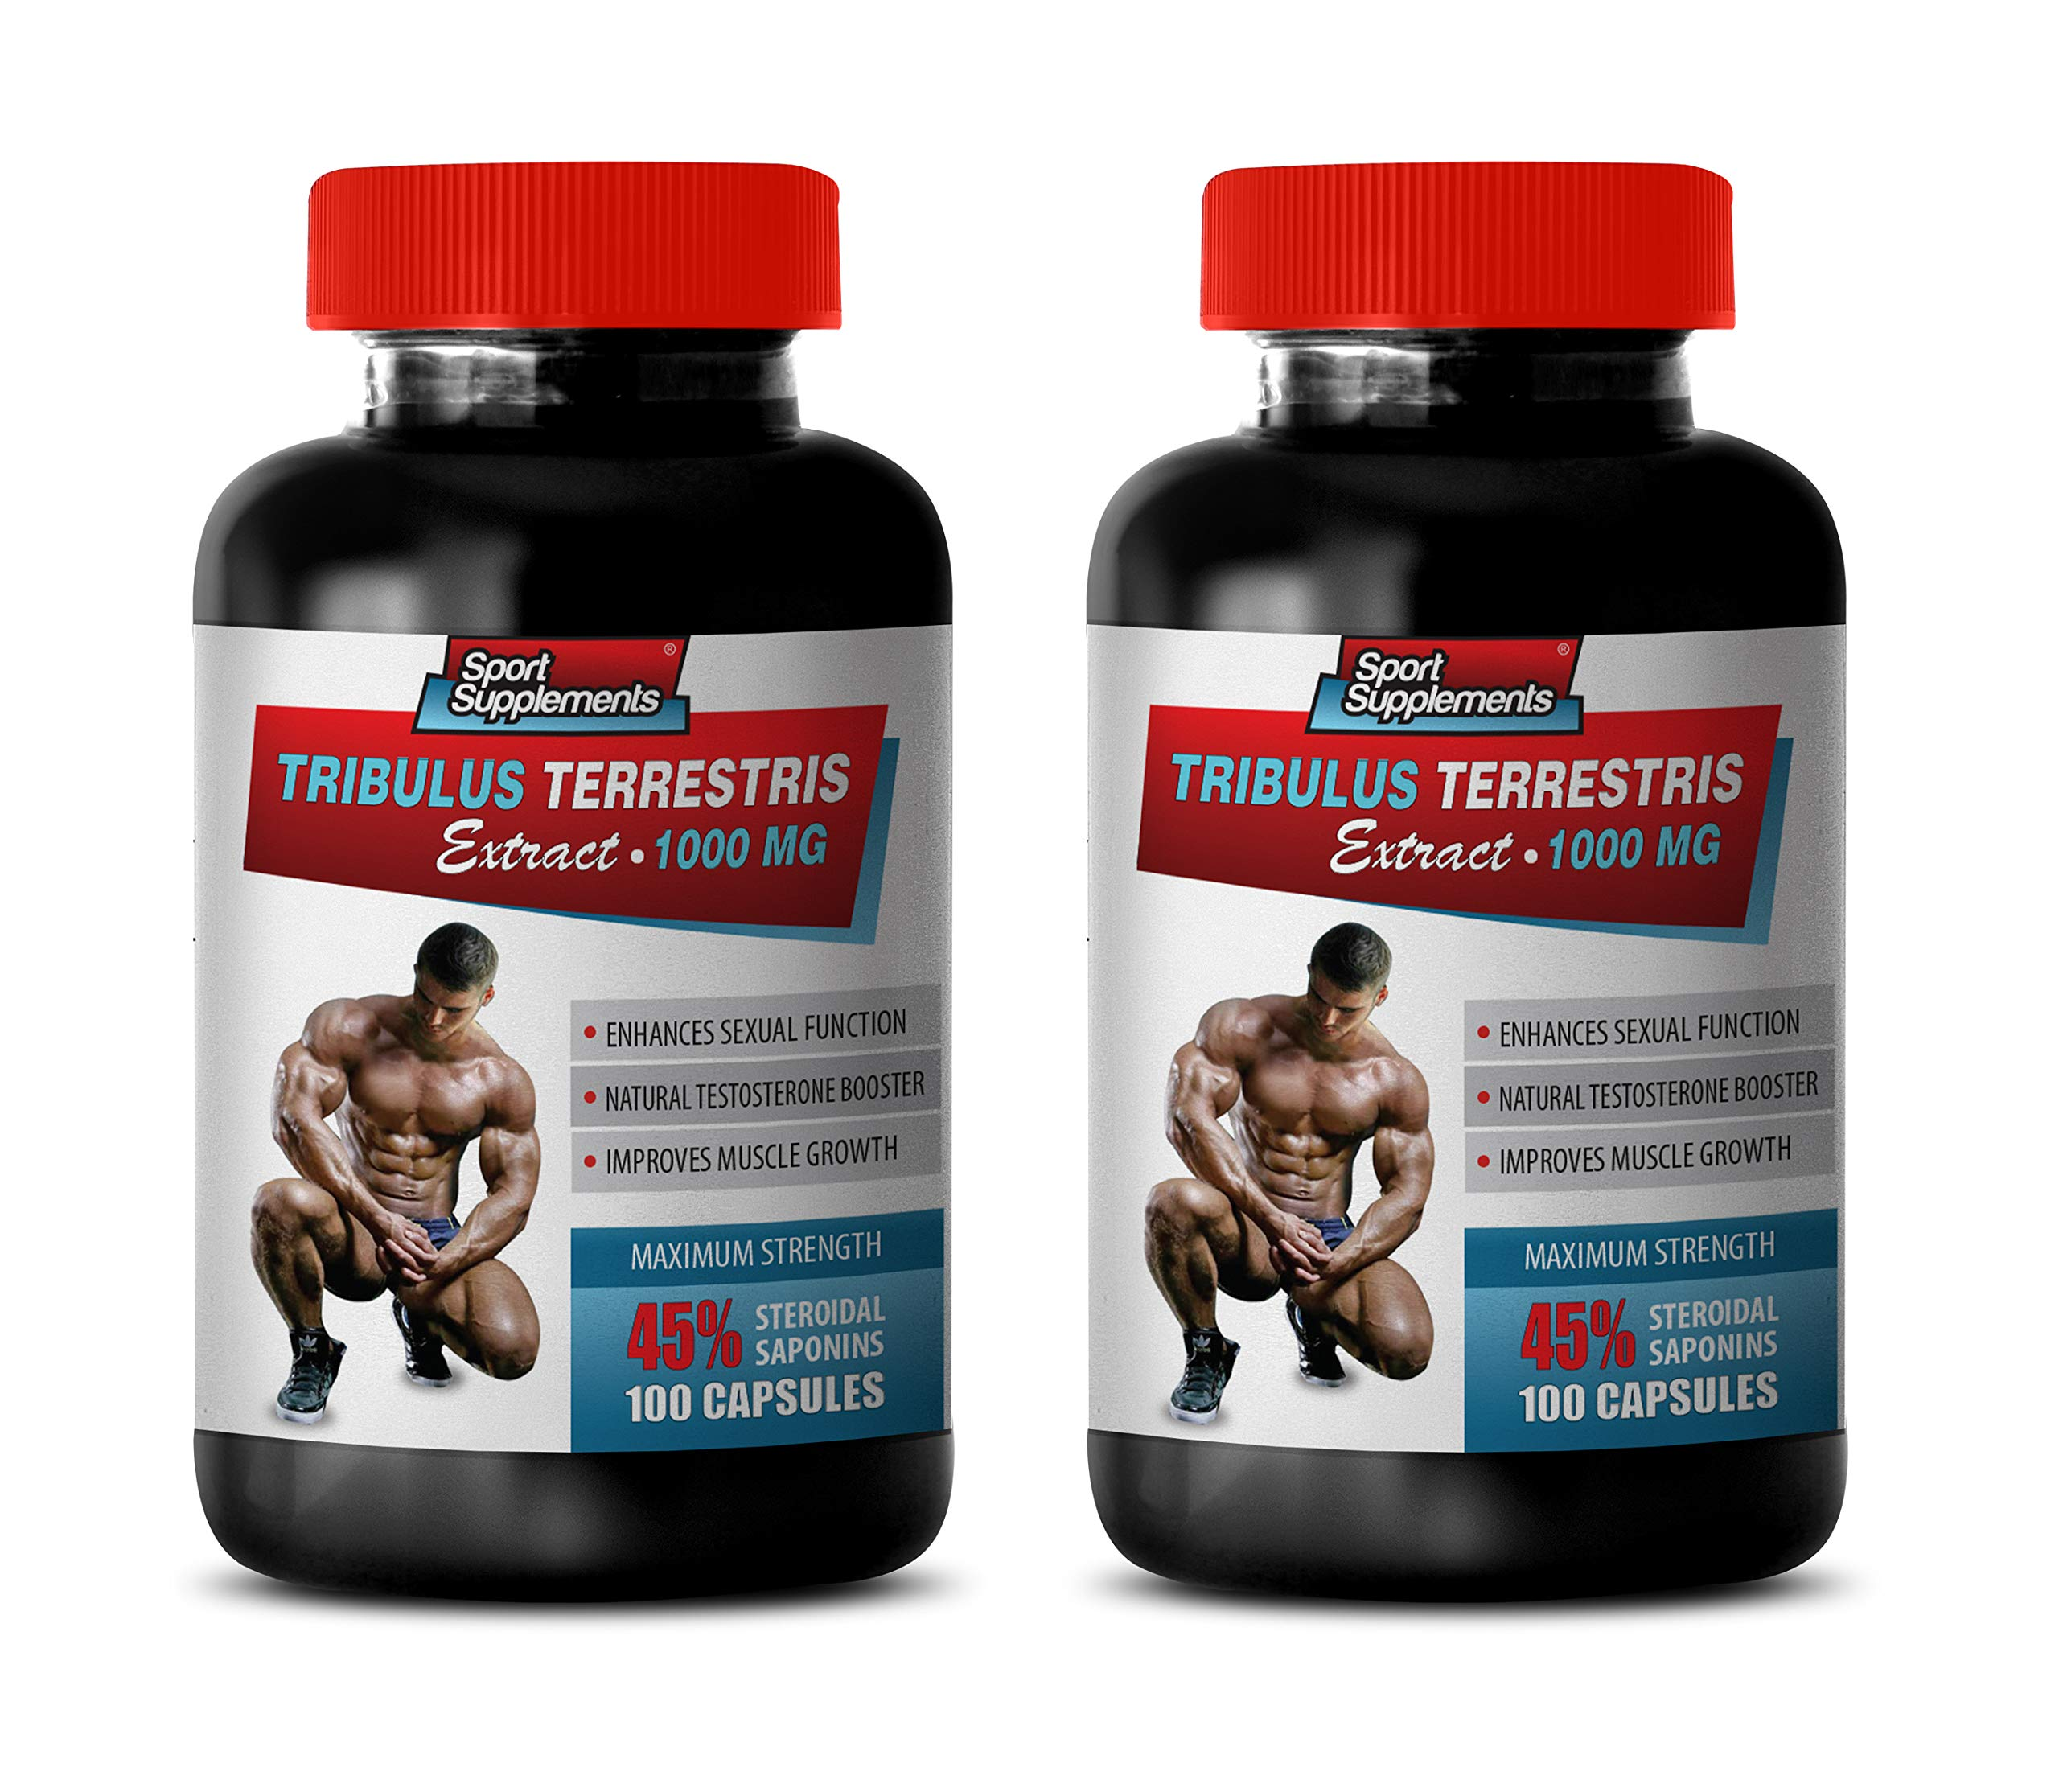 libido Care Extract - TRIBULUS TERRESTRIS Extract 1000MG - 45% STEROIDAL SAPONINS - Maximum Strength - tribulus Nutrition - 2 Bottles 200 Capsules